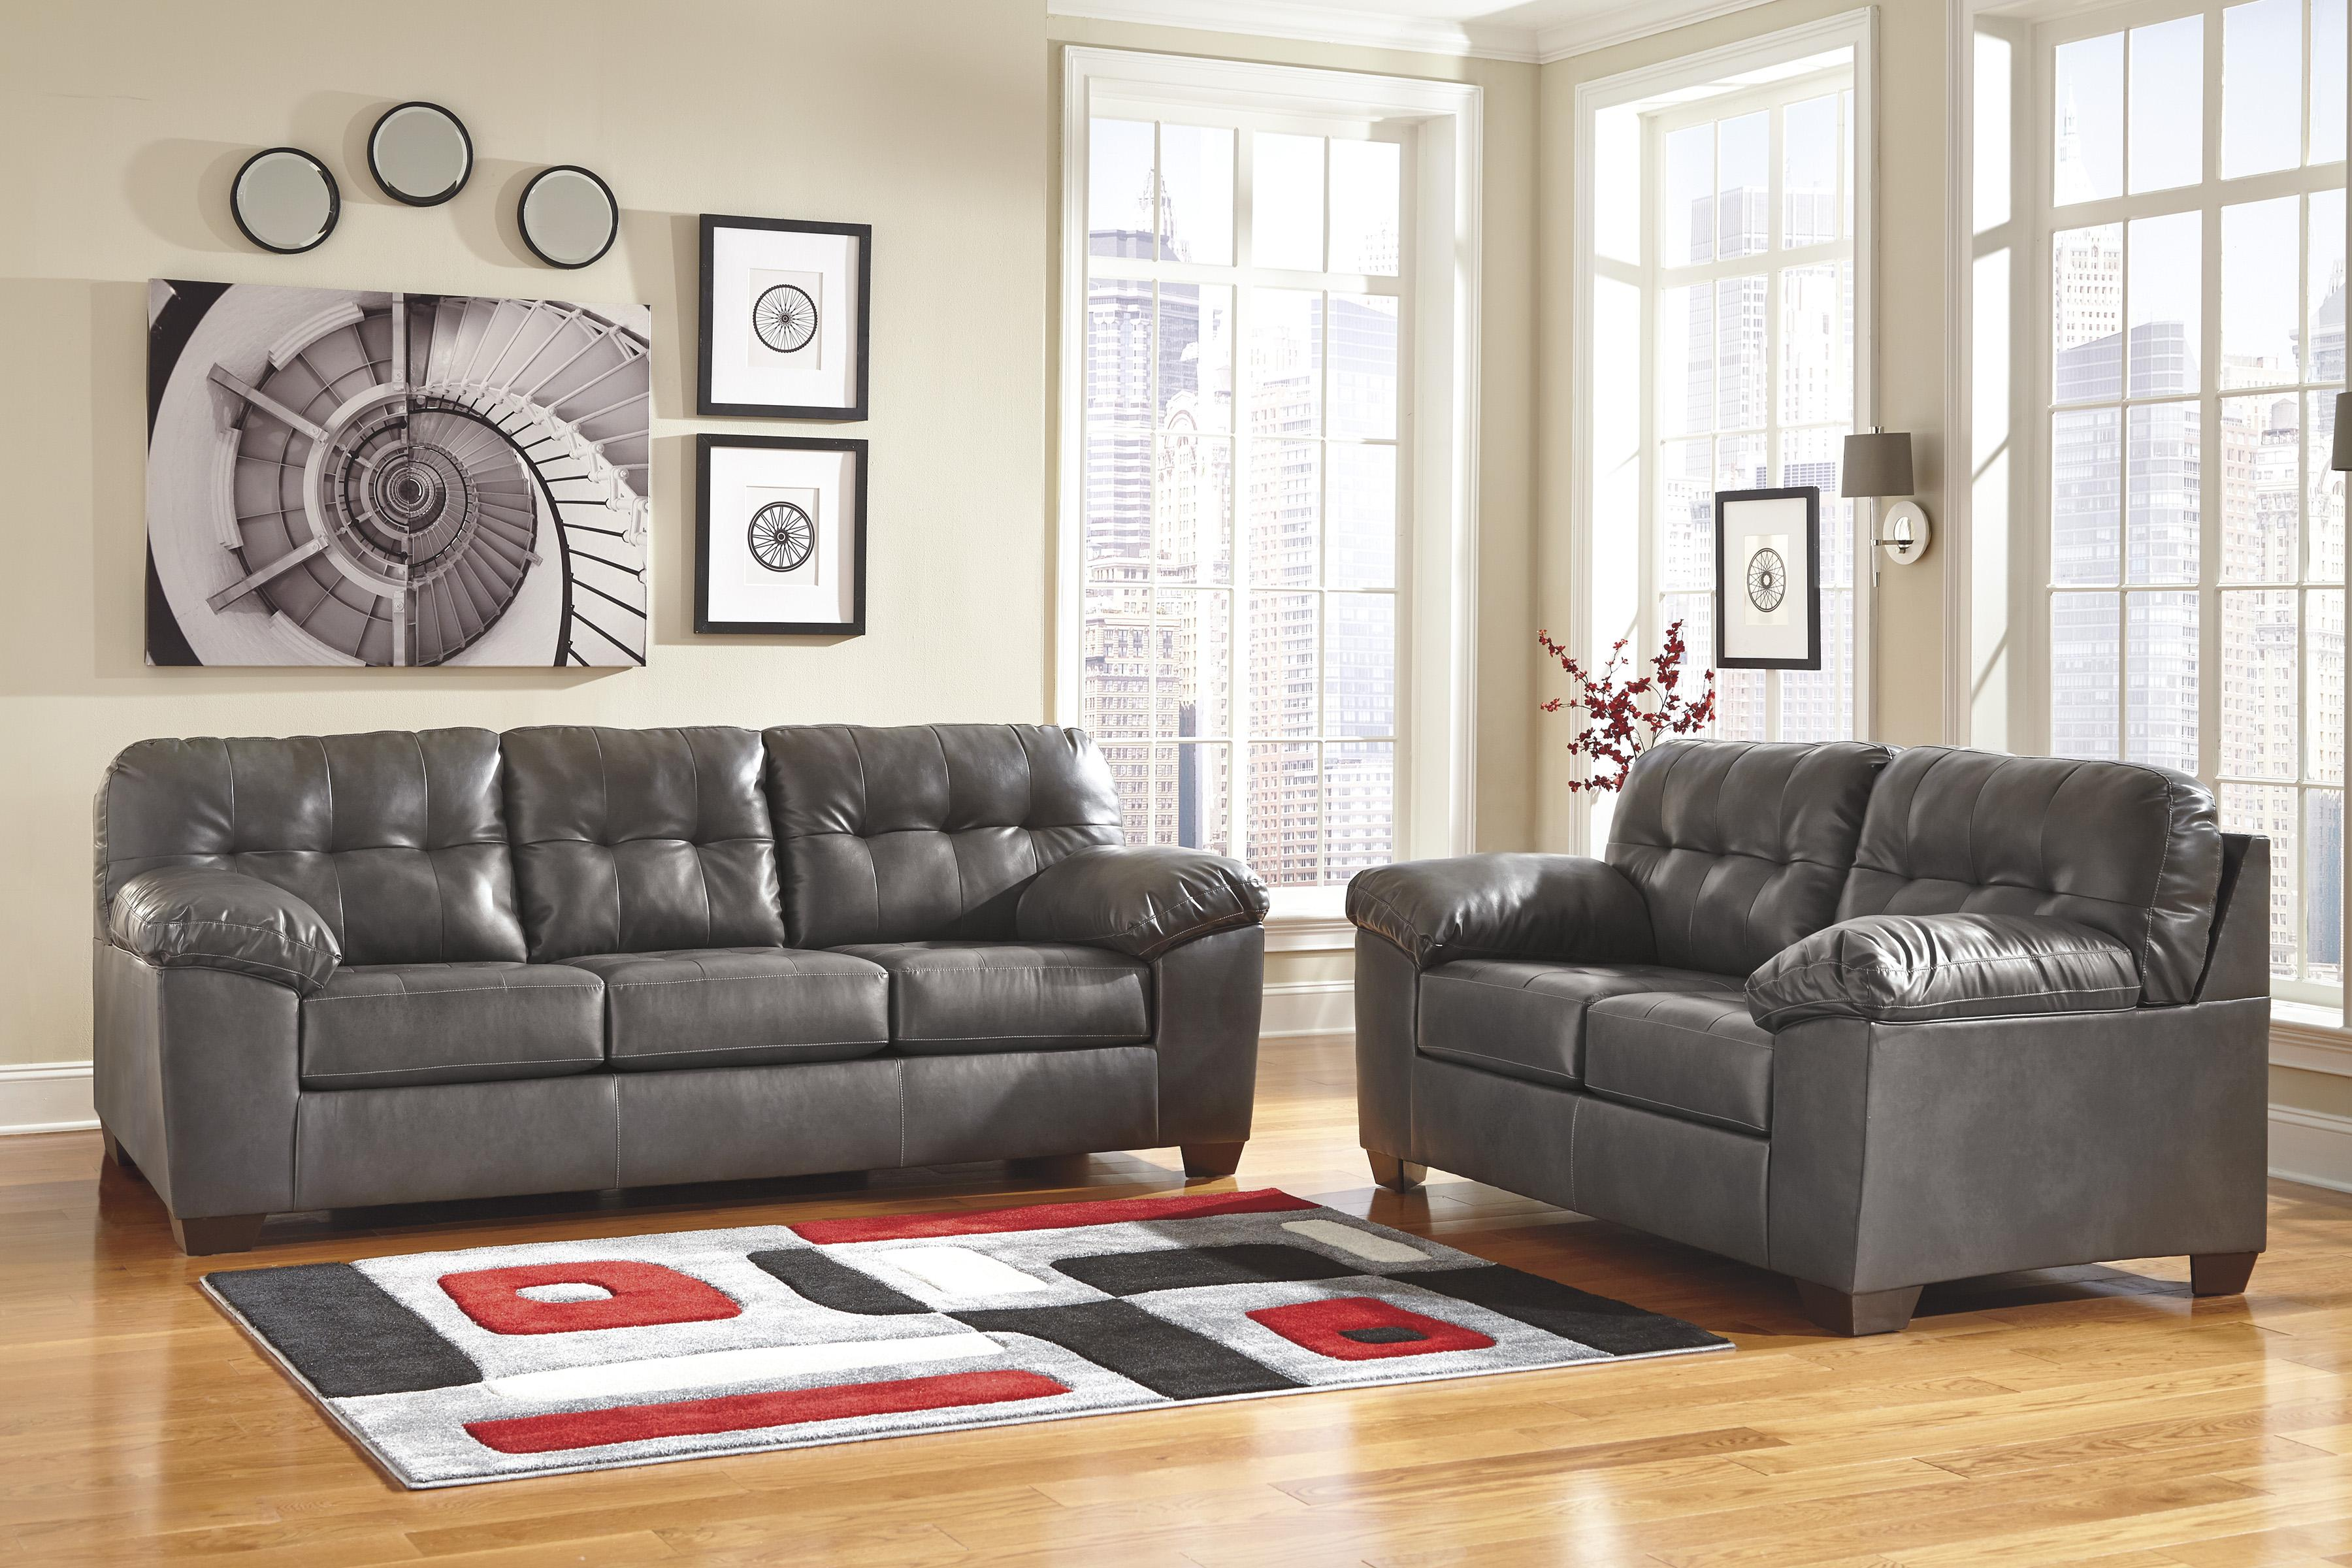 signature design by ashley alliston durablend gray